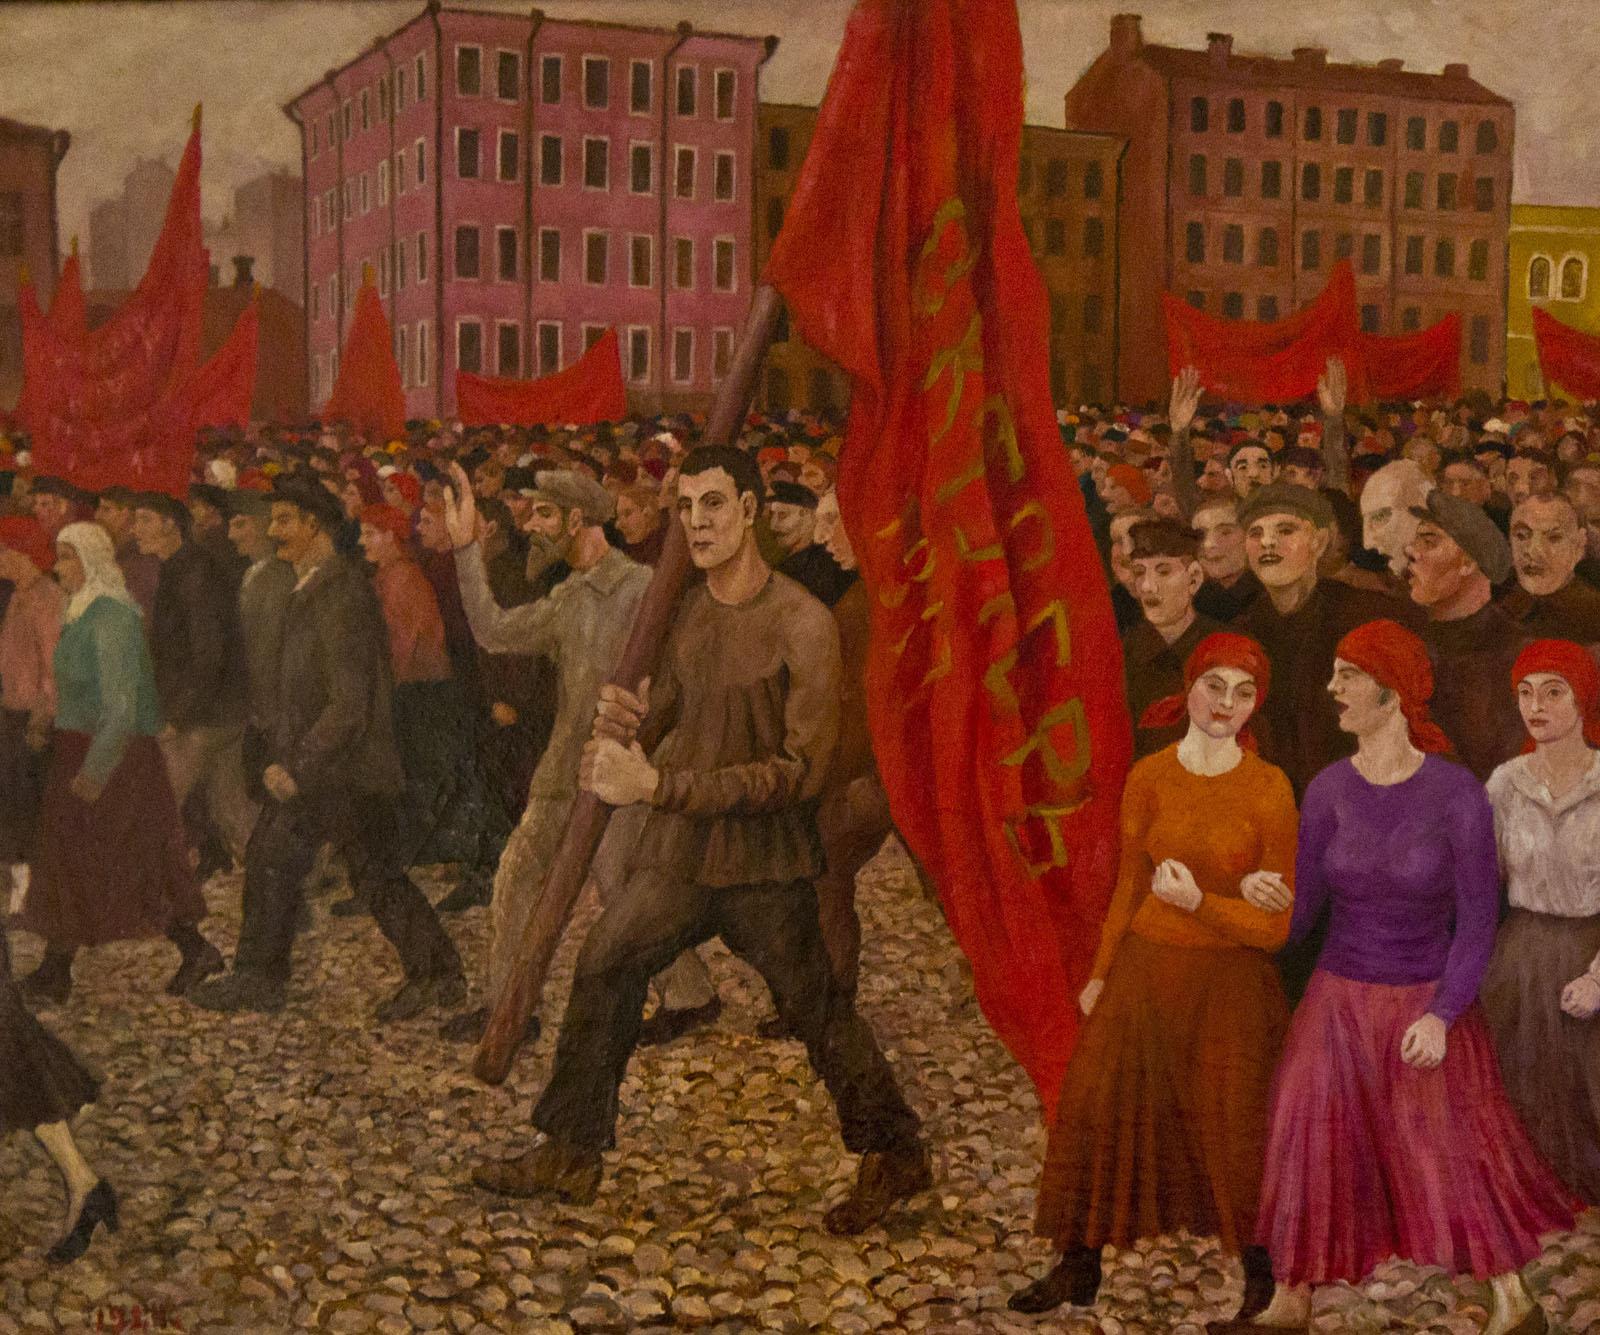 Фото №79899. Монин А.А (1896-1969). Демонстрация. 1924